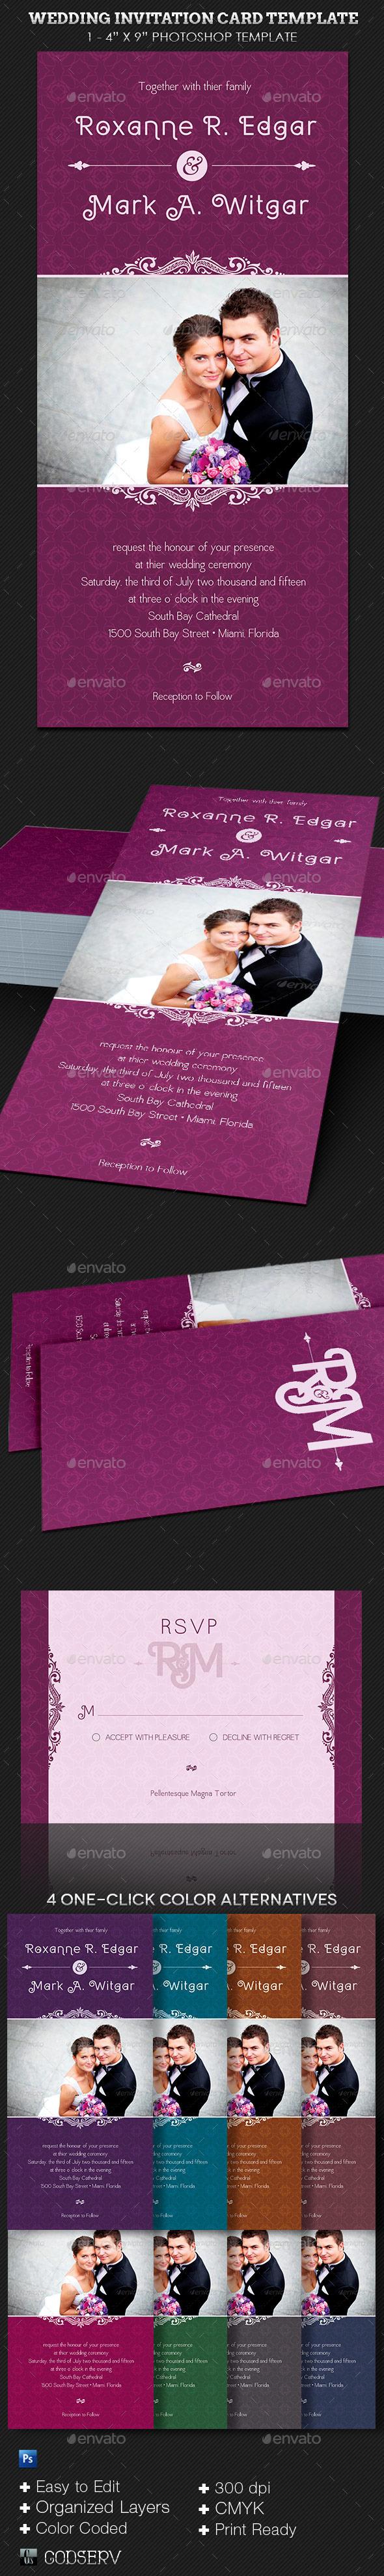 Wedding Invitation Card Template - Invitations Cards & Invites